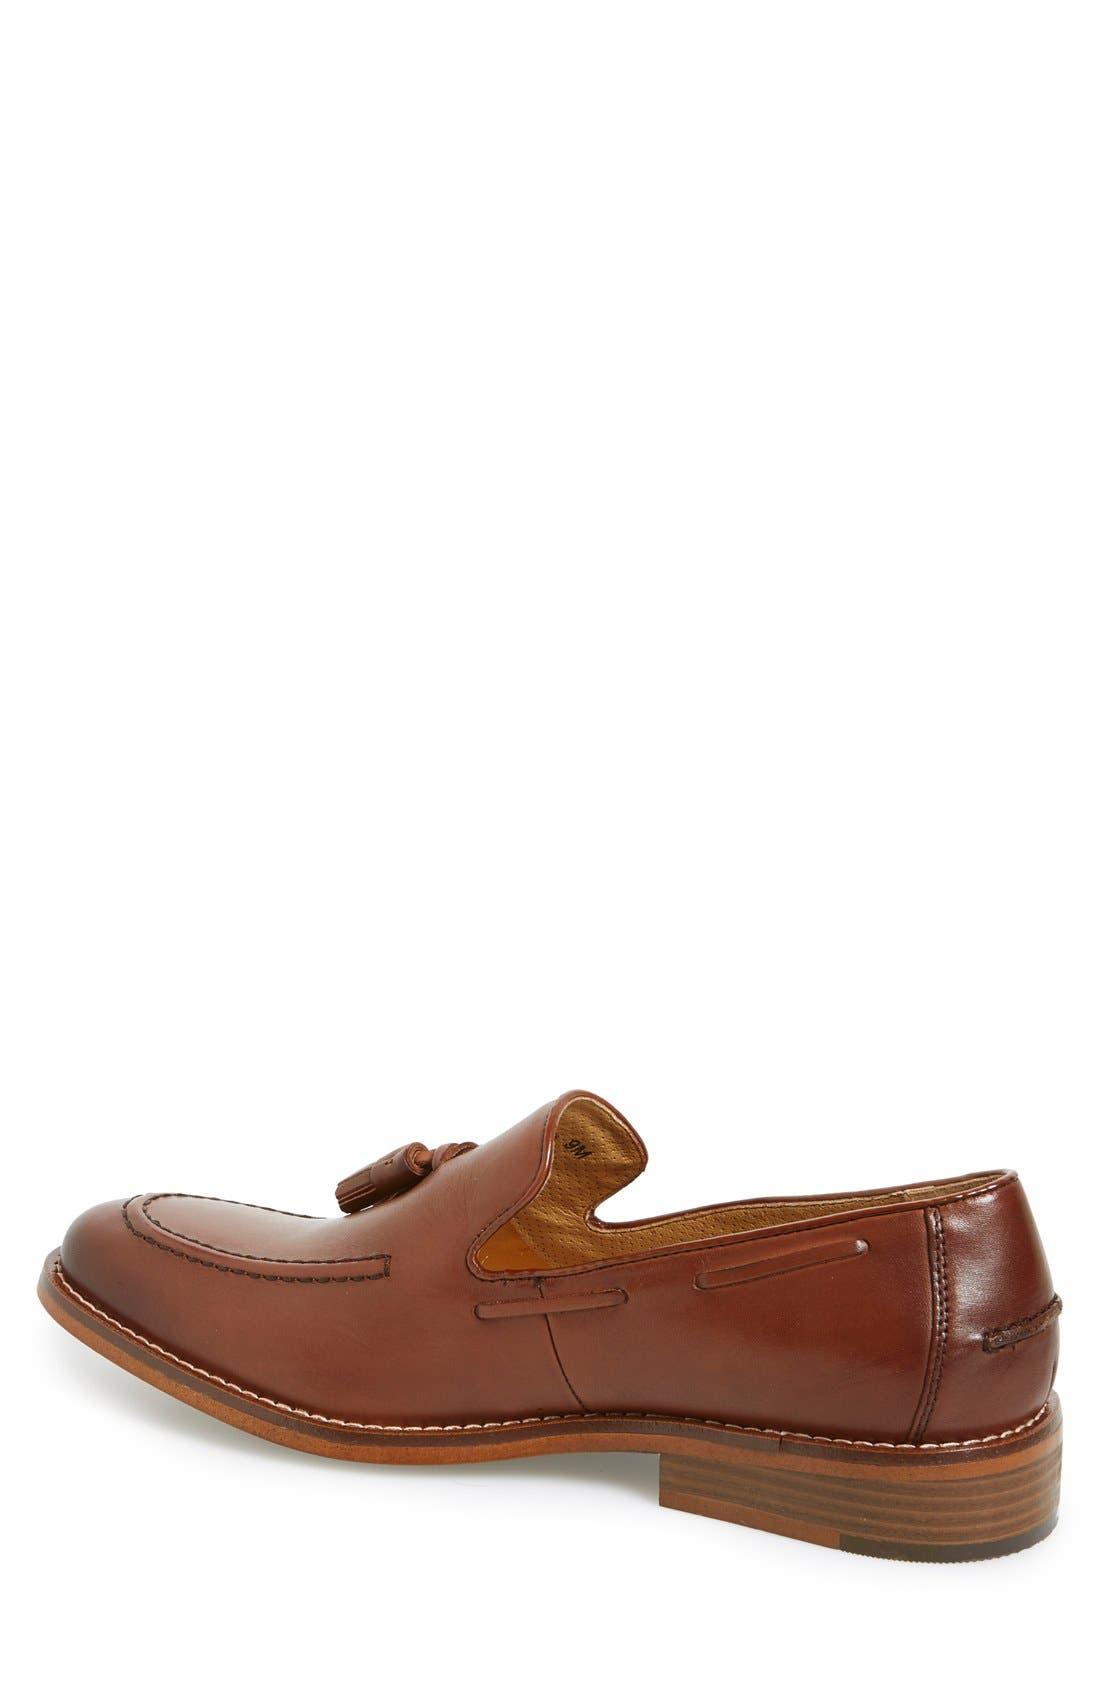 'Cooper' Tassel Loafer,                             Alternate thumbnail 2, color,                             Tan Leather